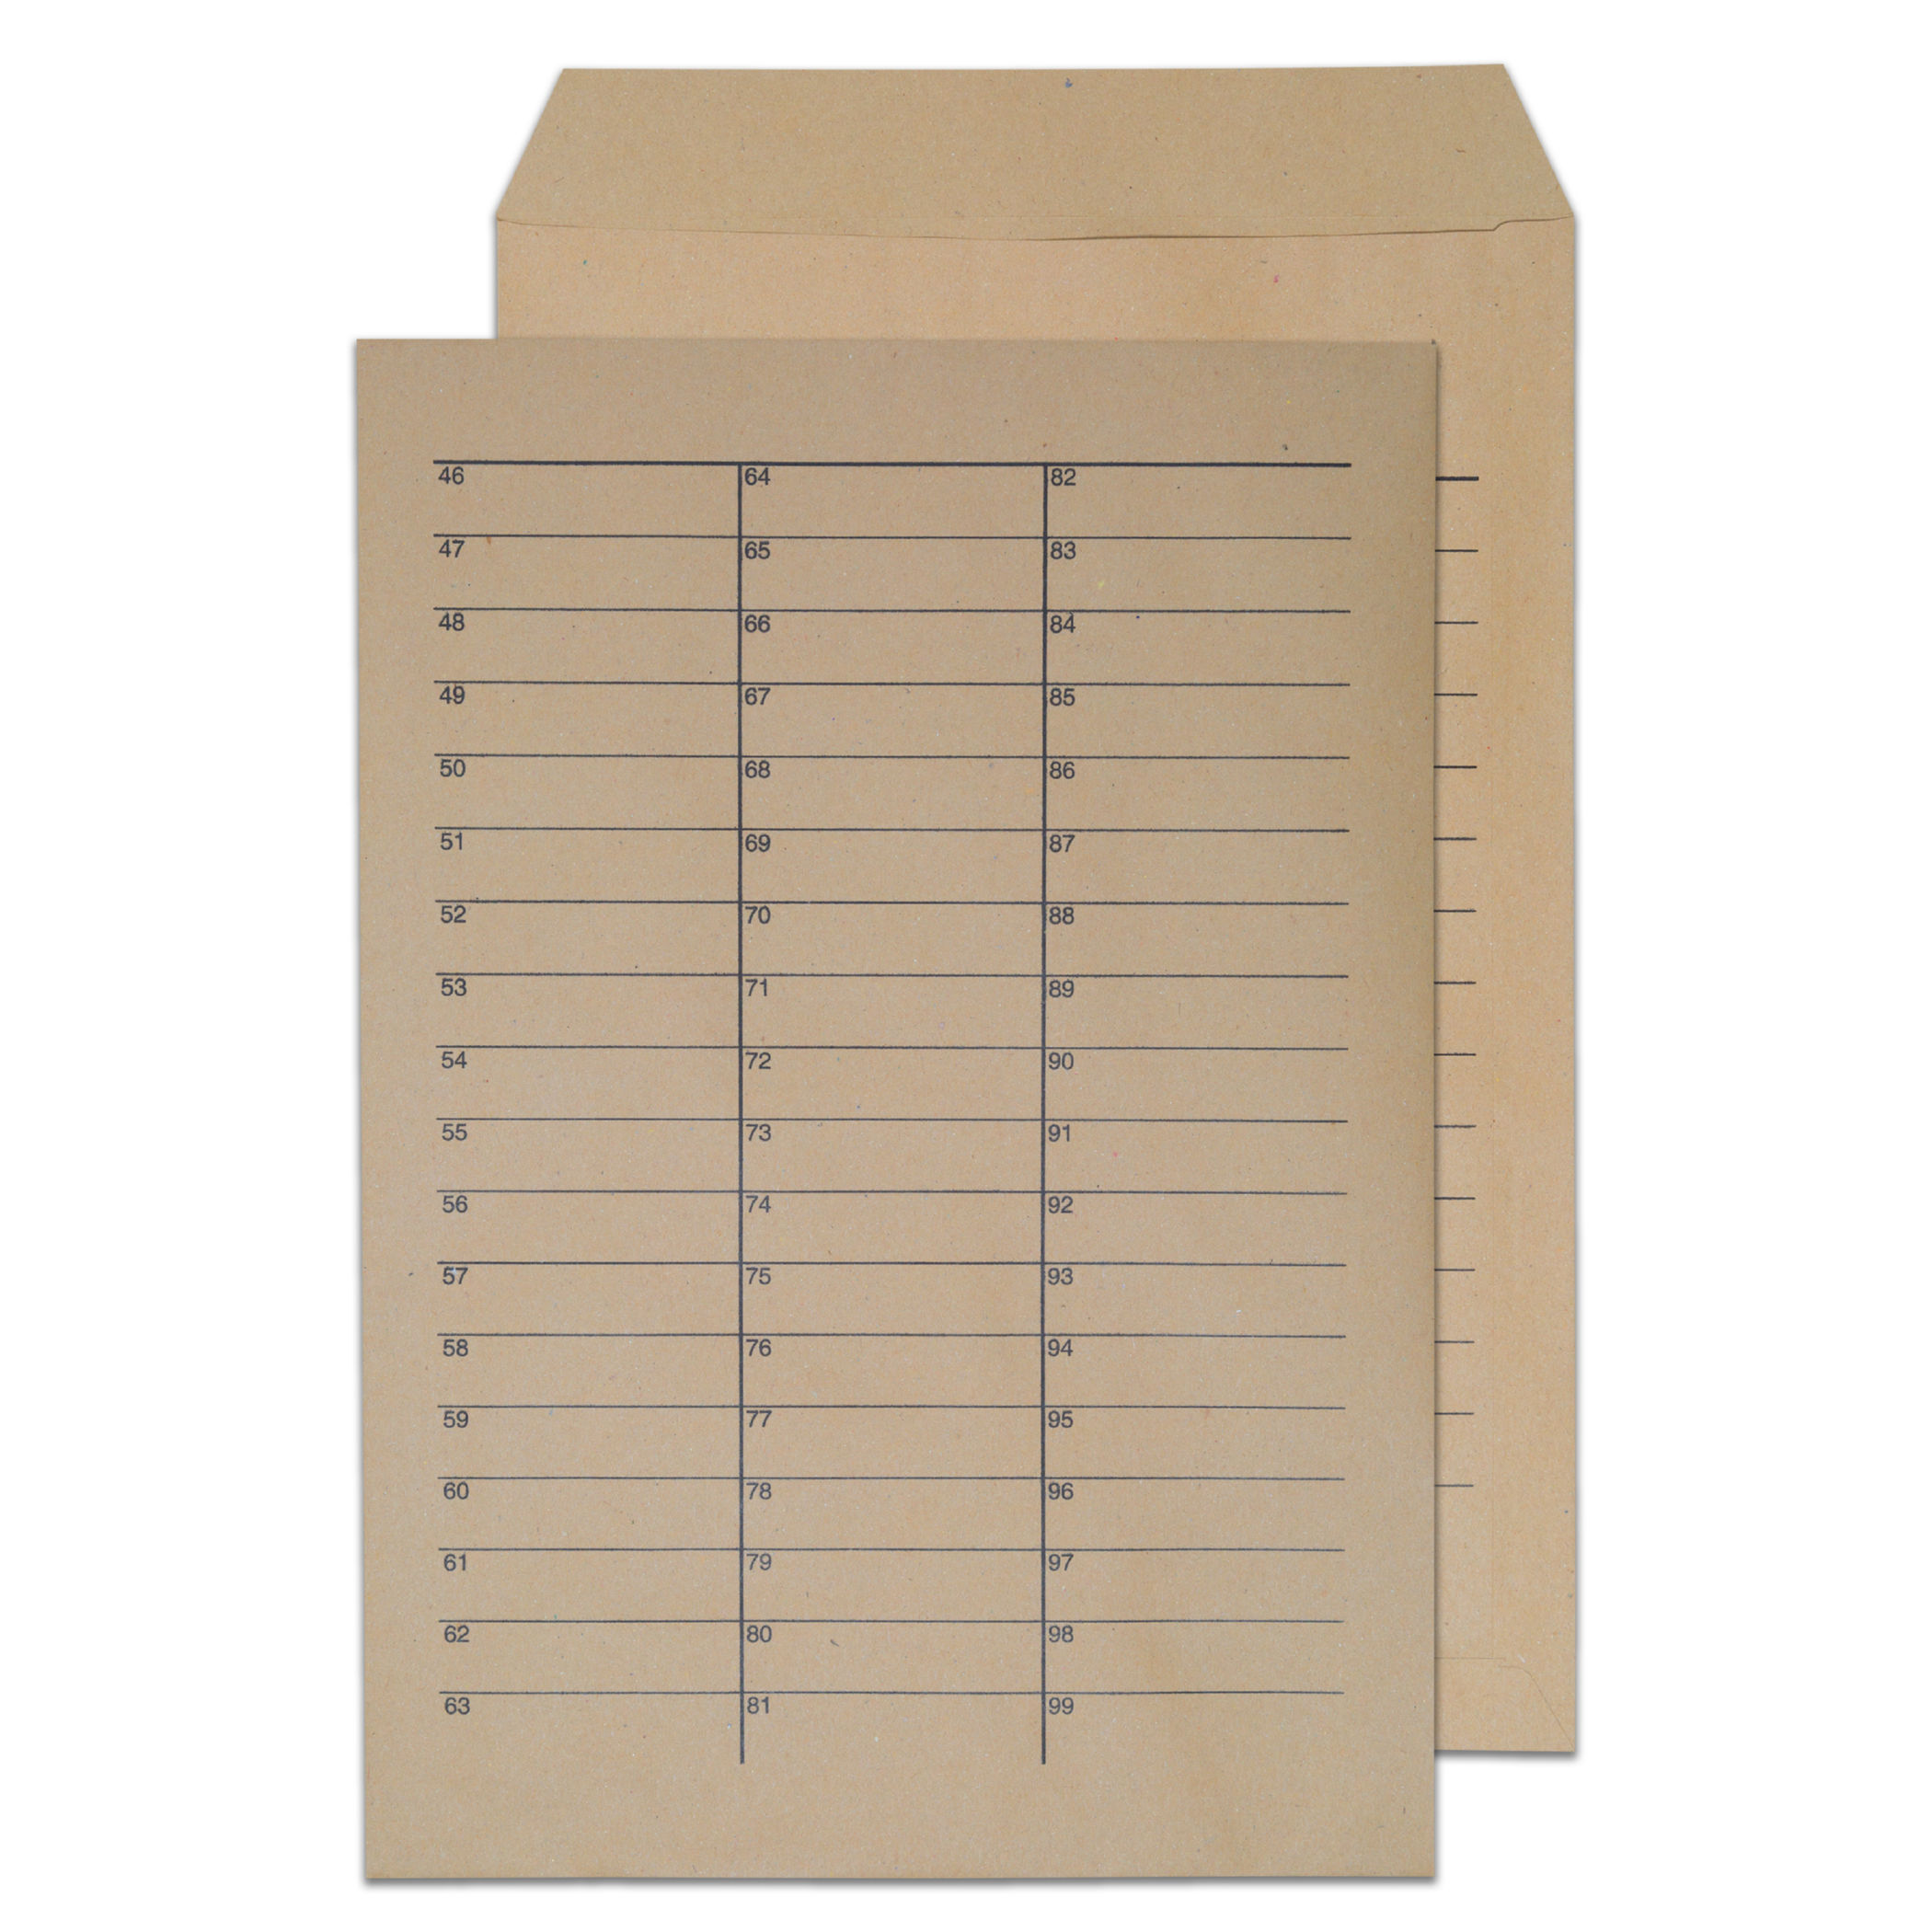 C4 ValueX Pocket Internal Mail Envelope C4 90gsm Manilla (Pack 250)